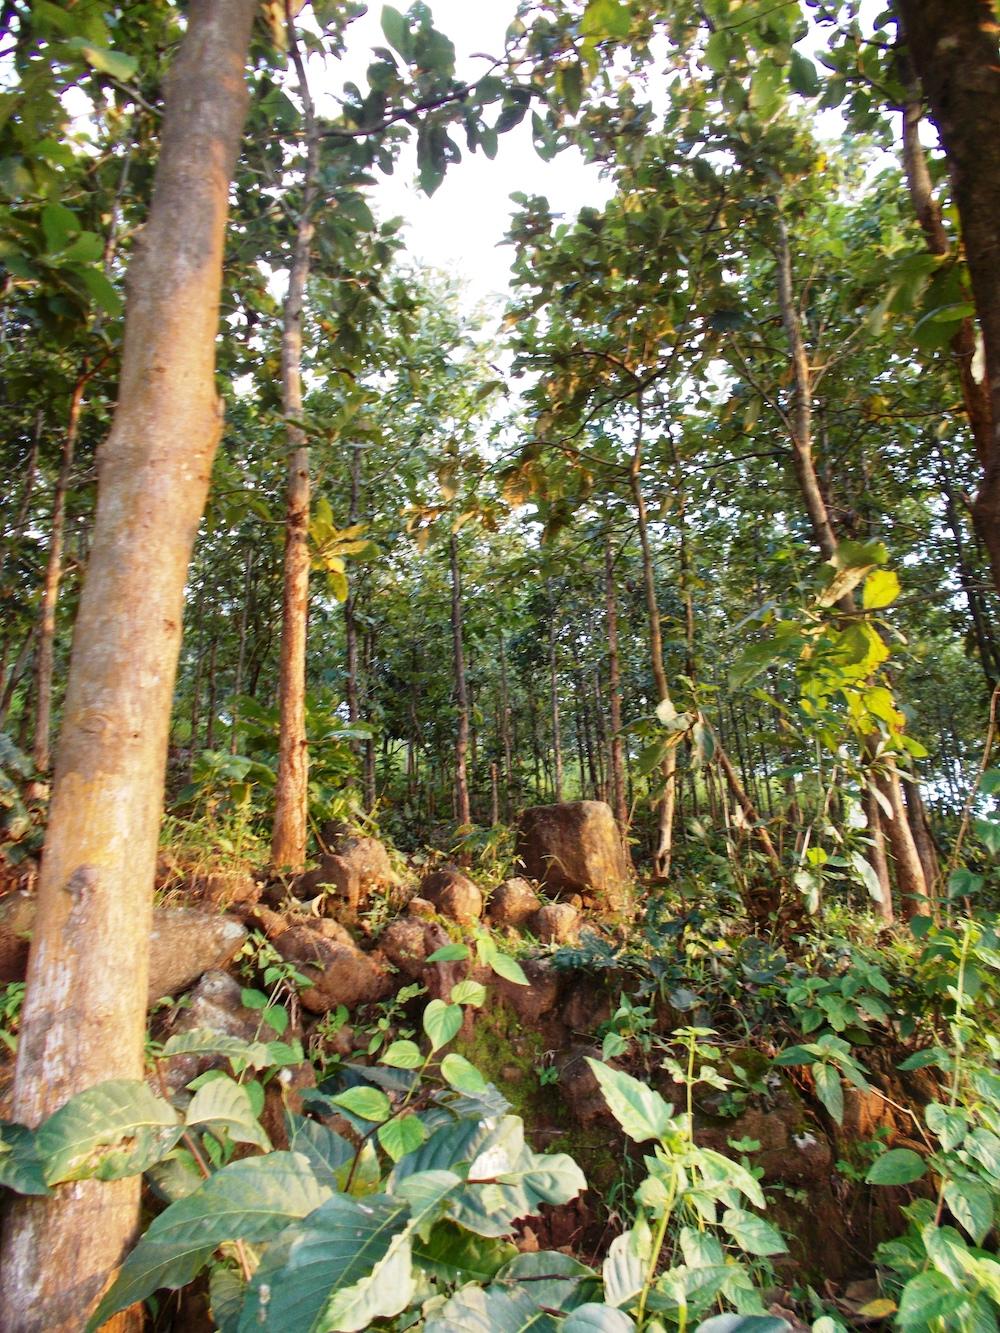 Compensated teak forest